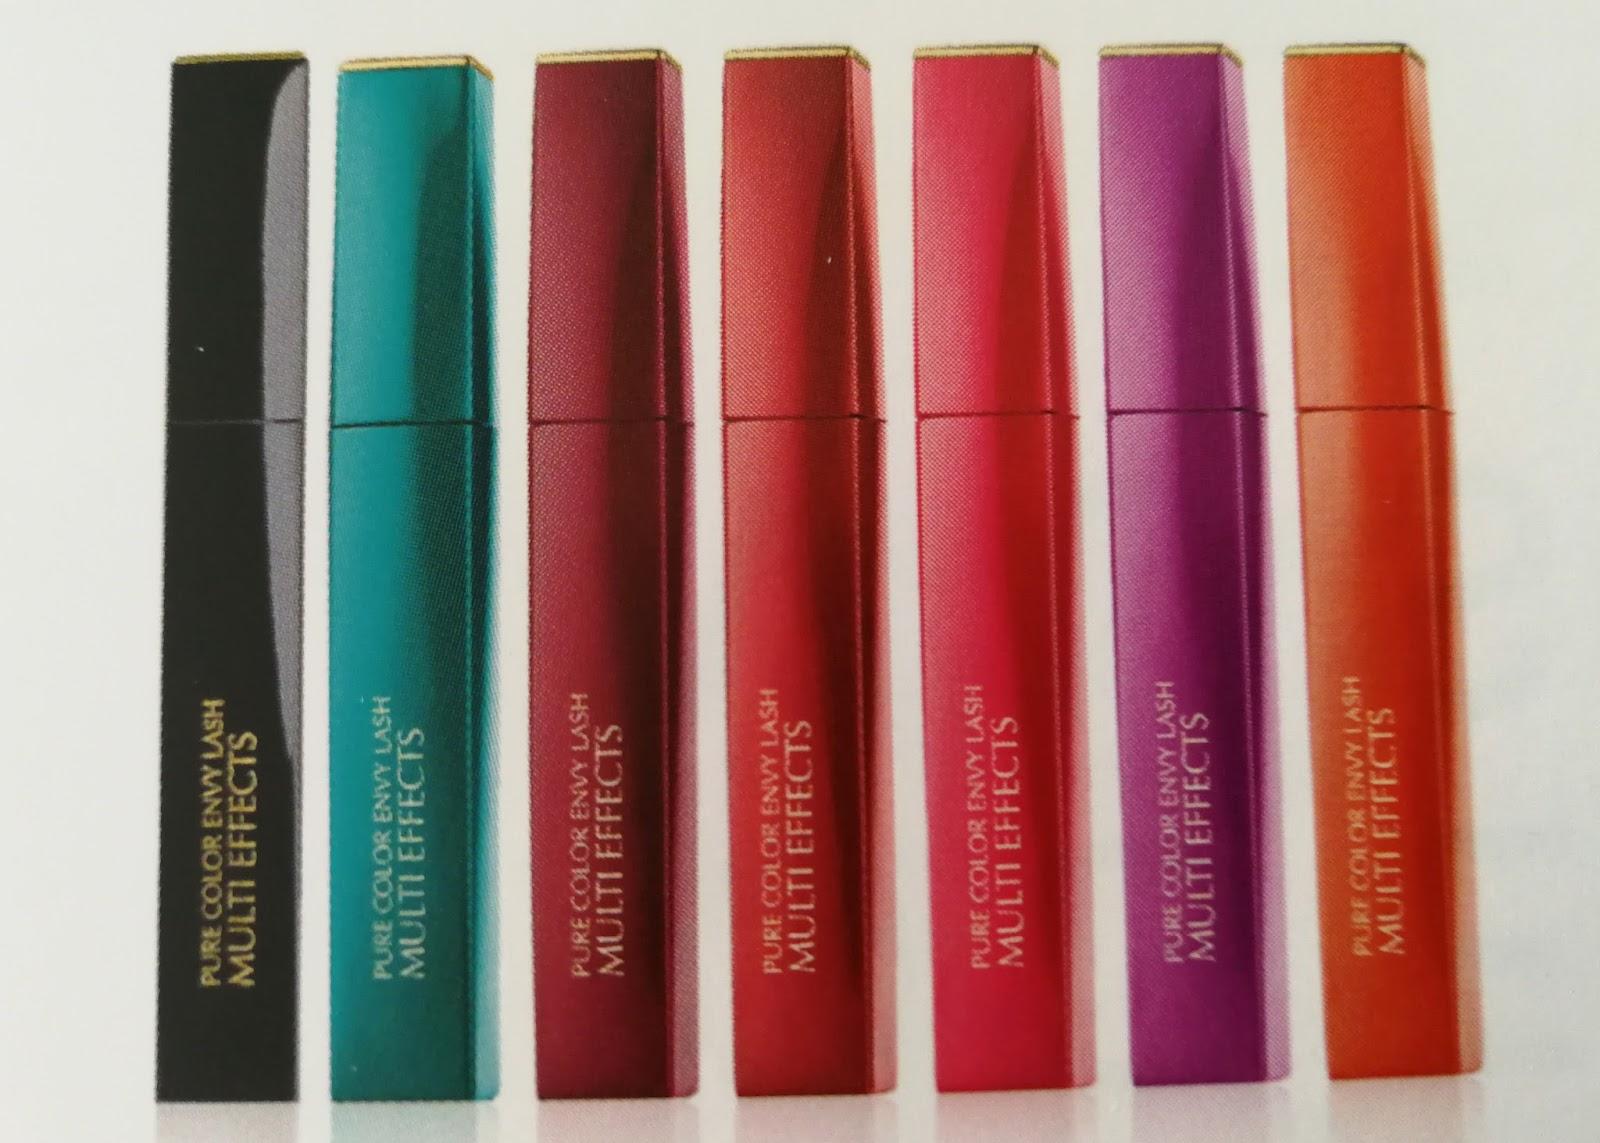 farbige mascara im test welche farbe passt zu dir flyinghousewives. Black Bedroom Furniture Sets. Home Design Ideas